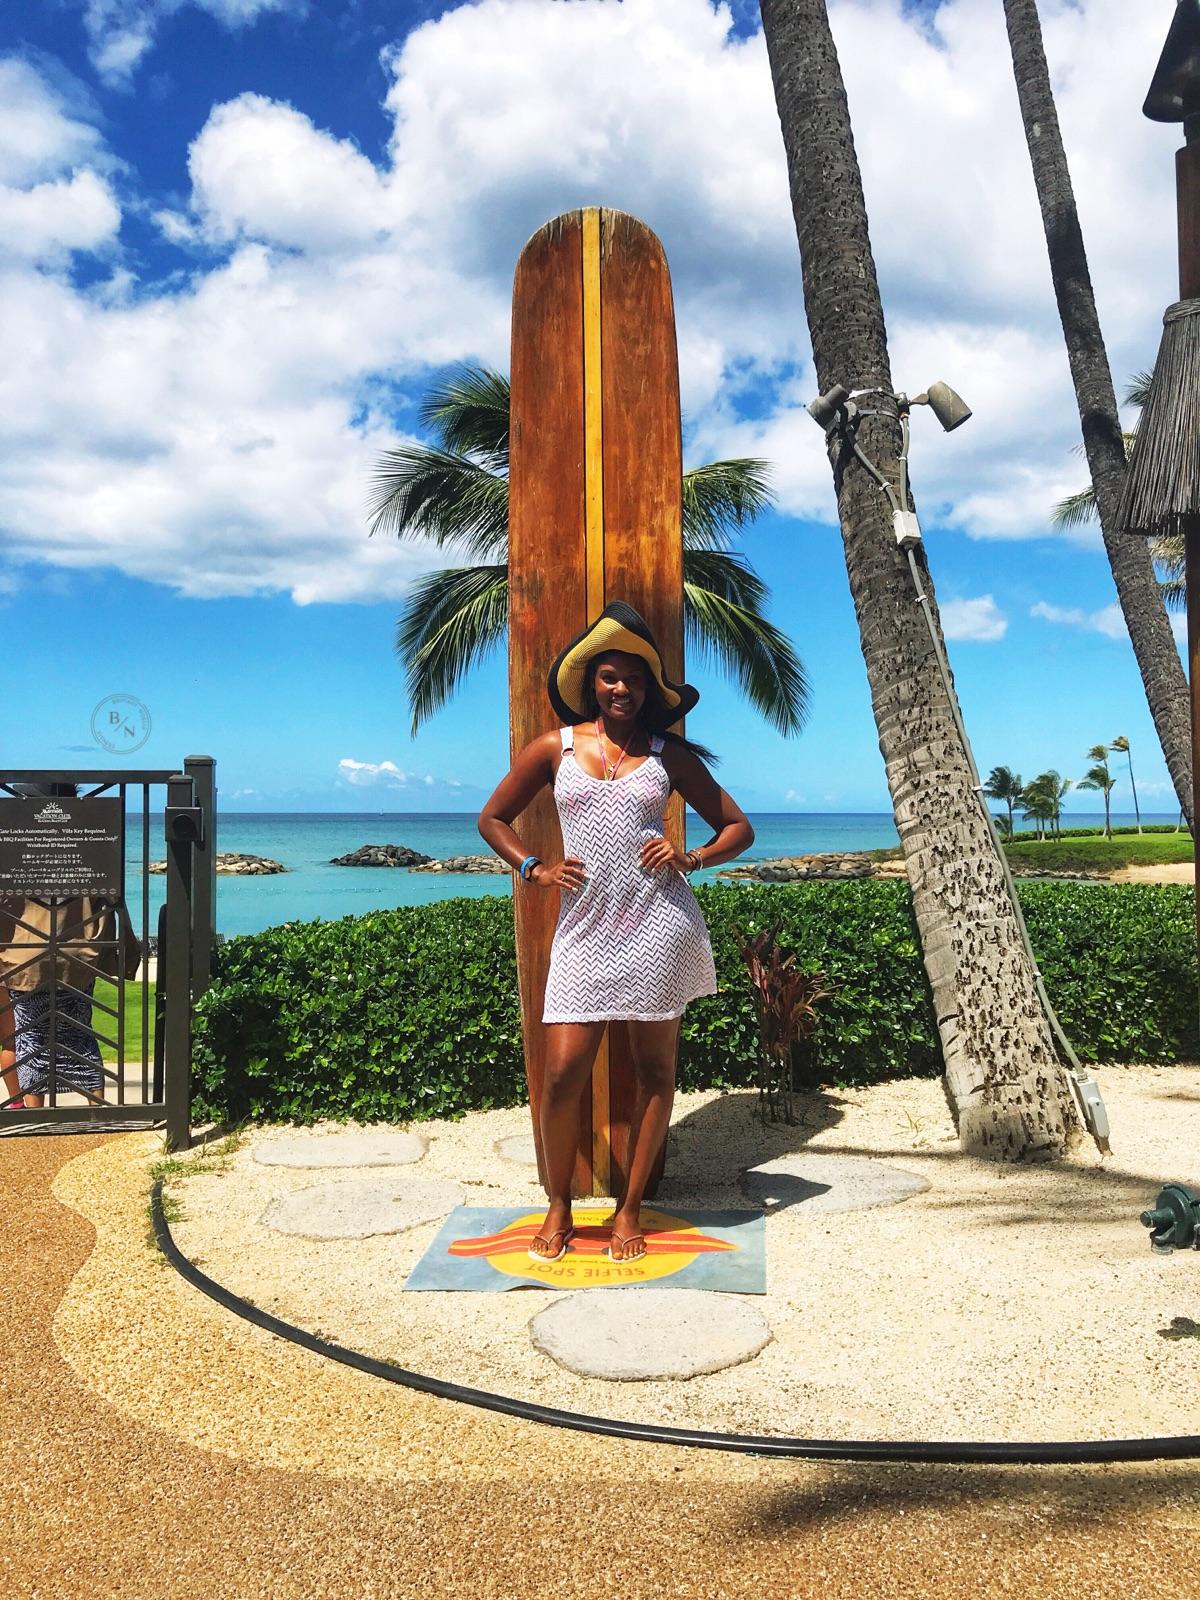 Marriott's Ko'Olina Beach Resort